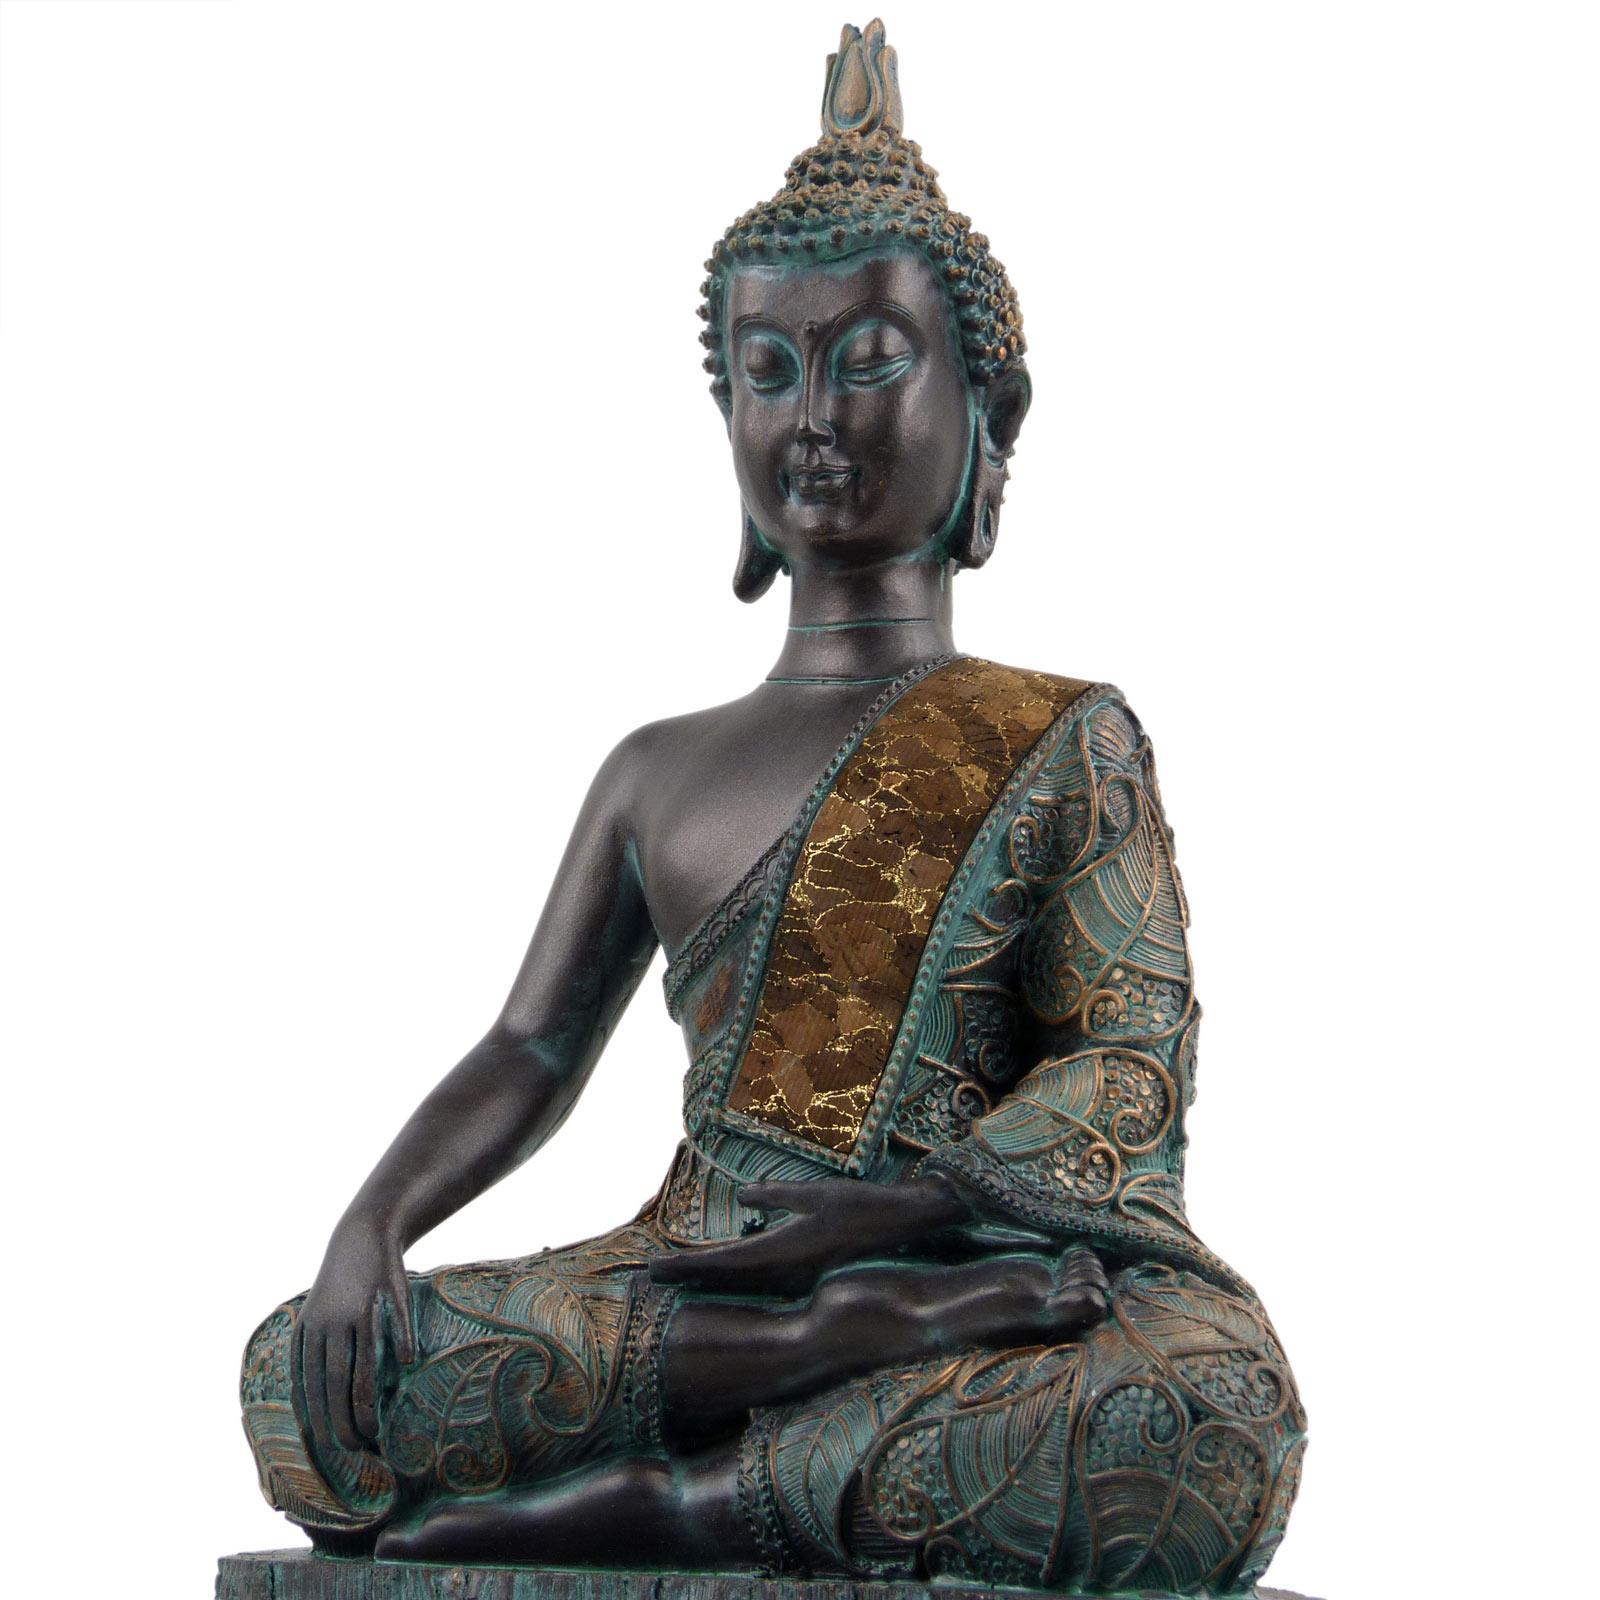 Verdin-Buda-Tailandes-23cm-Alto-4-Disenos-Meditacion-Mindfulness-Metta miniatura 10